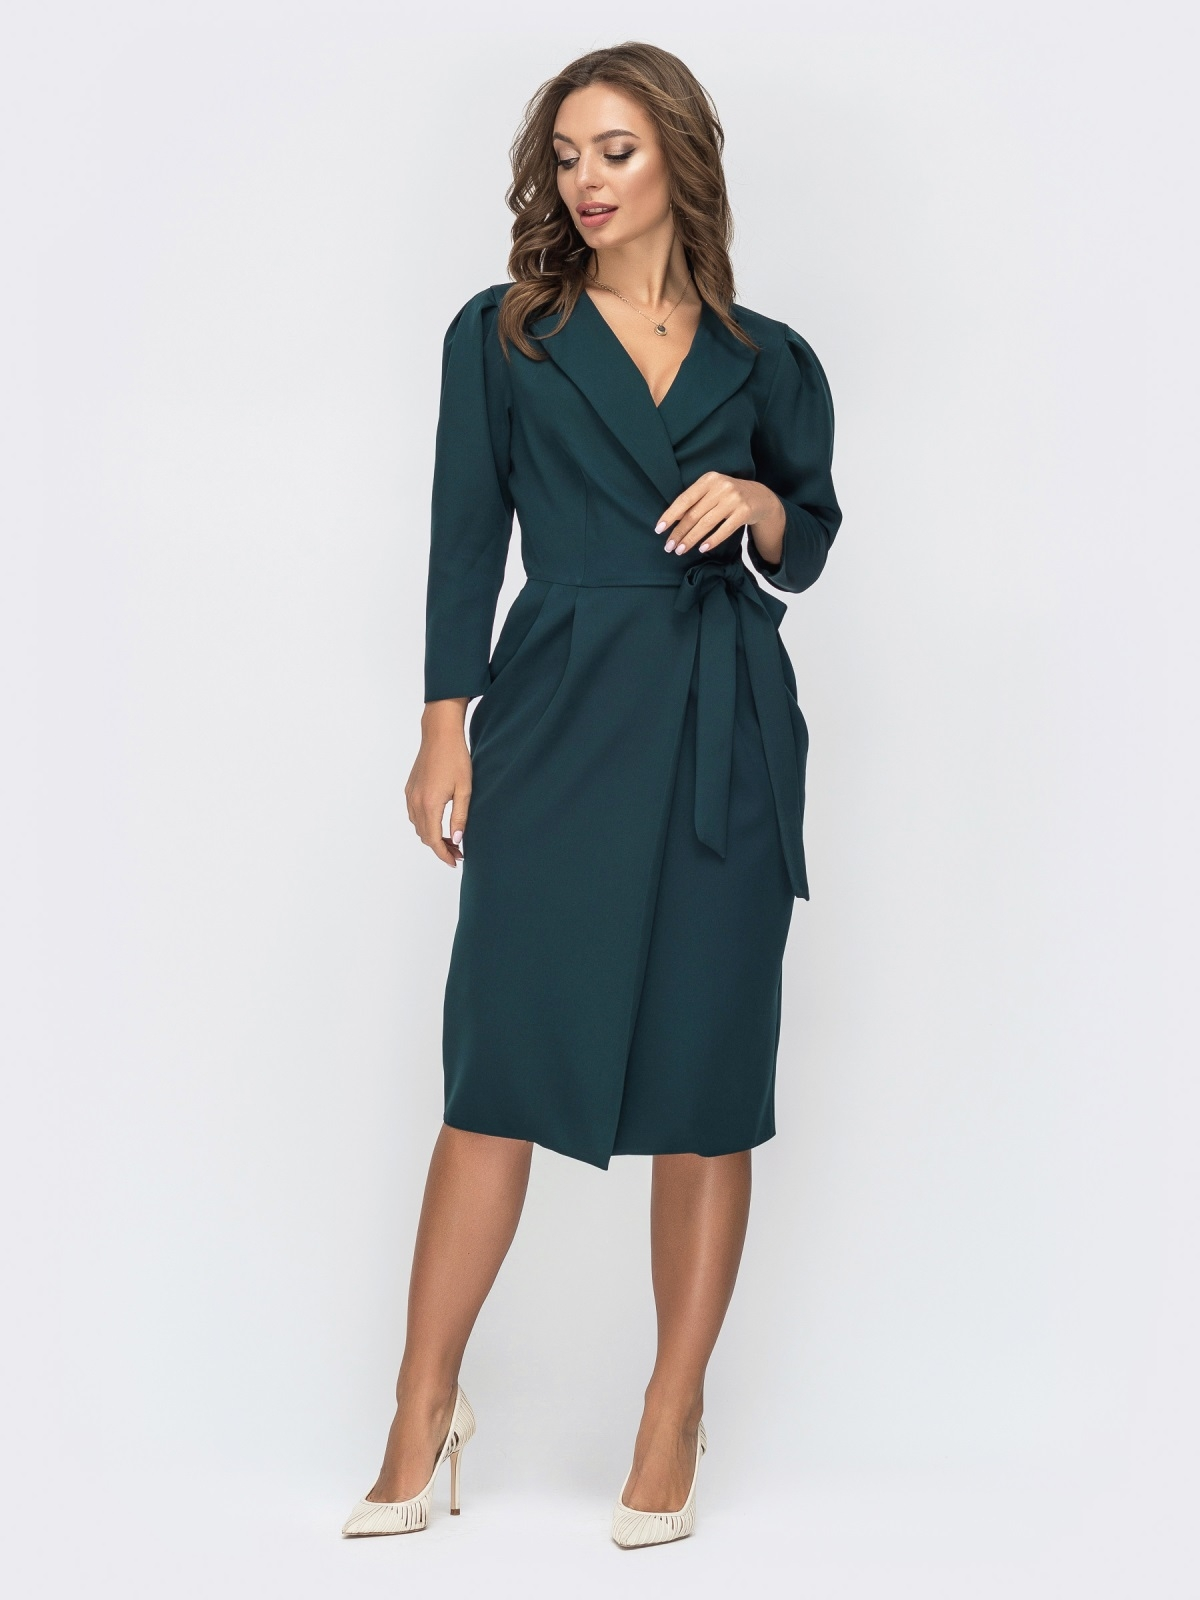 Зеленое платье на запах с лацканами 44821, фото 1